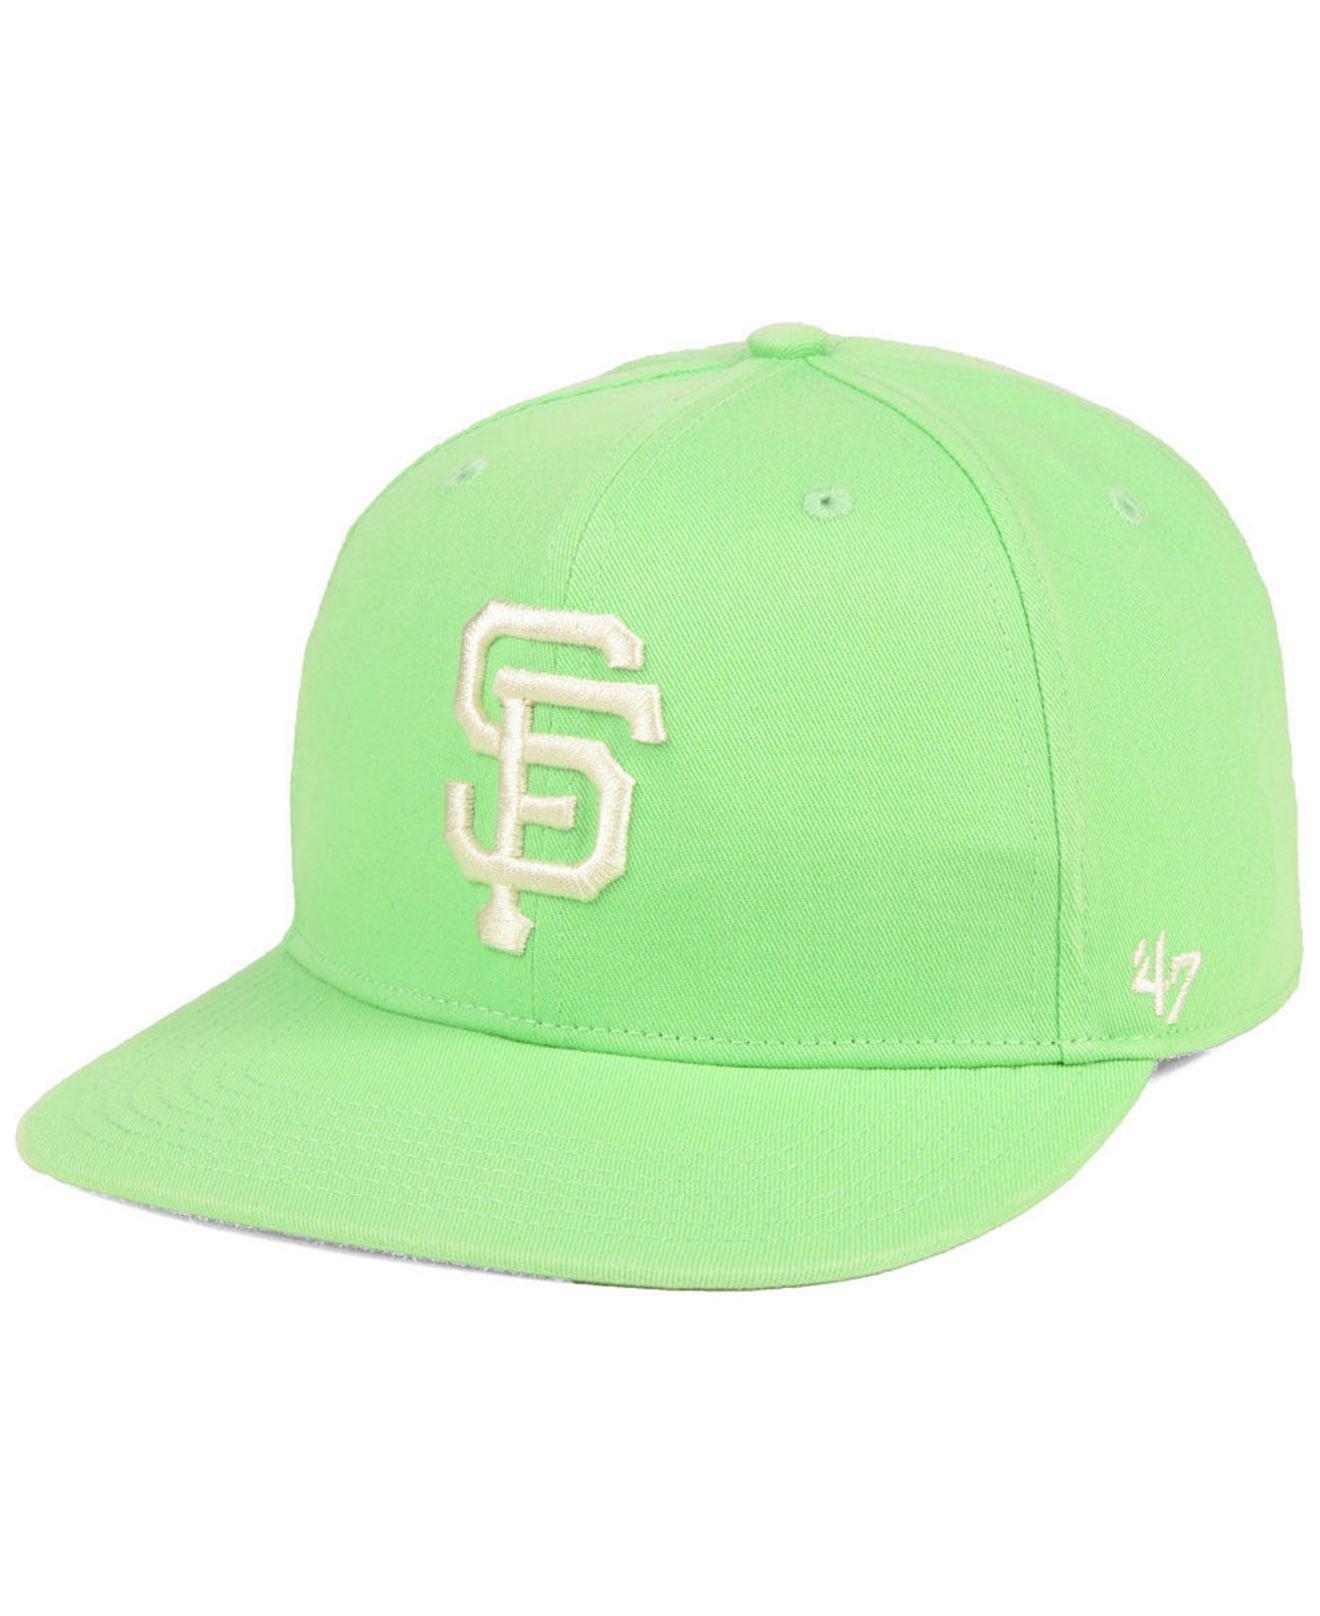 reputable site b218d c4f15 47 Brand. Men s Green San Francisco Giants Island Snapback Cap